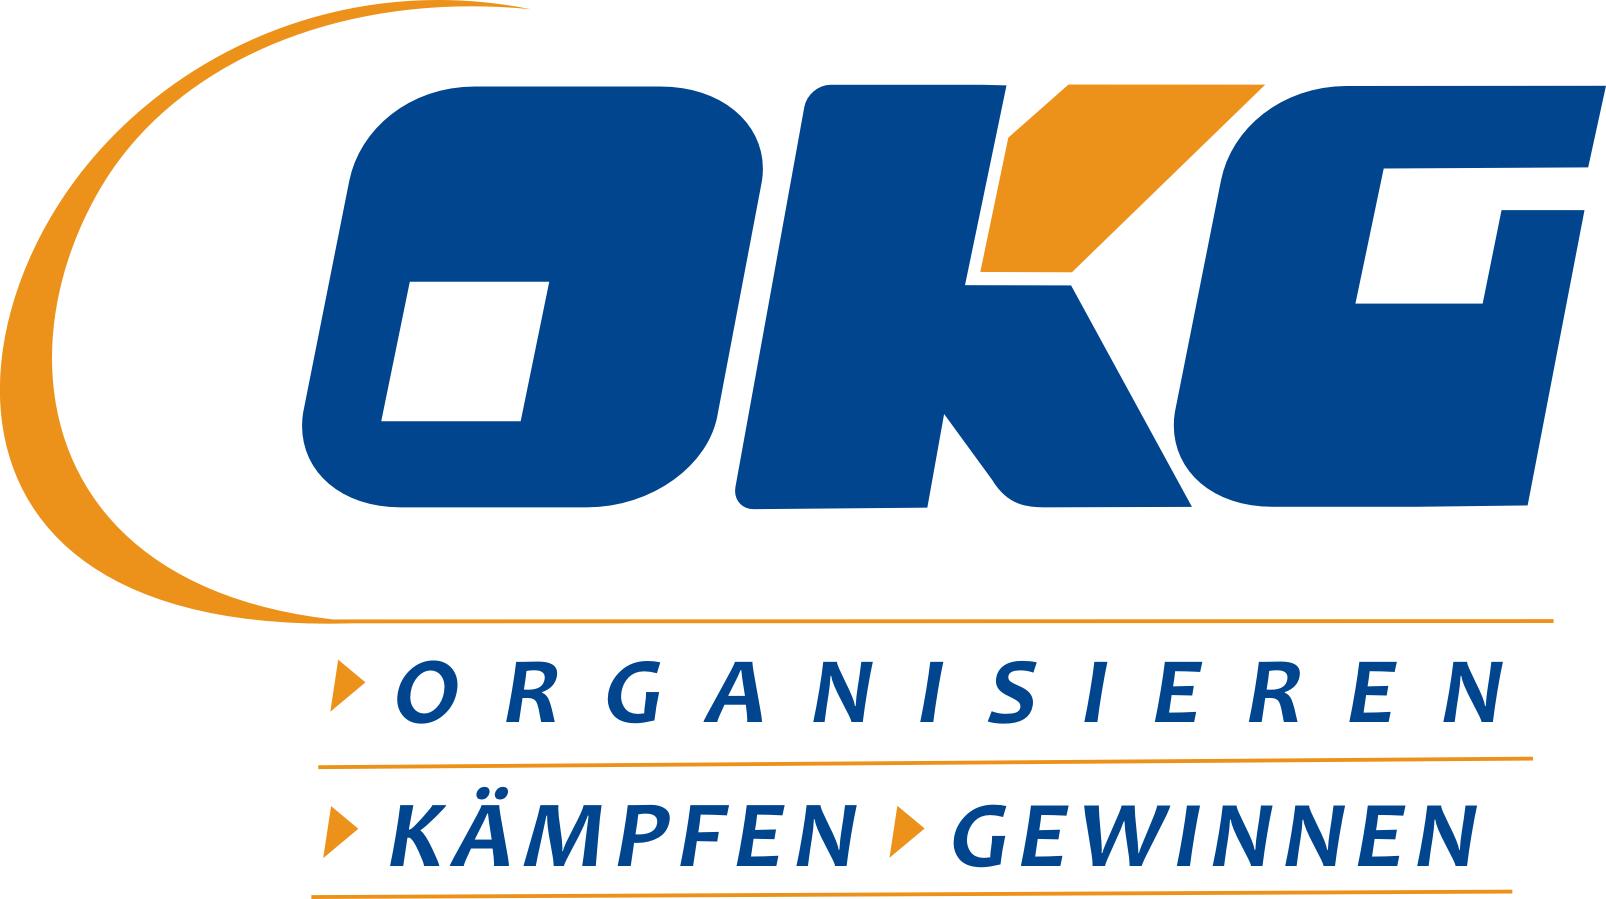 http://www.organisieren-gewinnen.de/fileadmin/Bilder/logookg.png